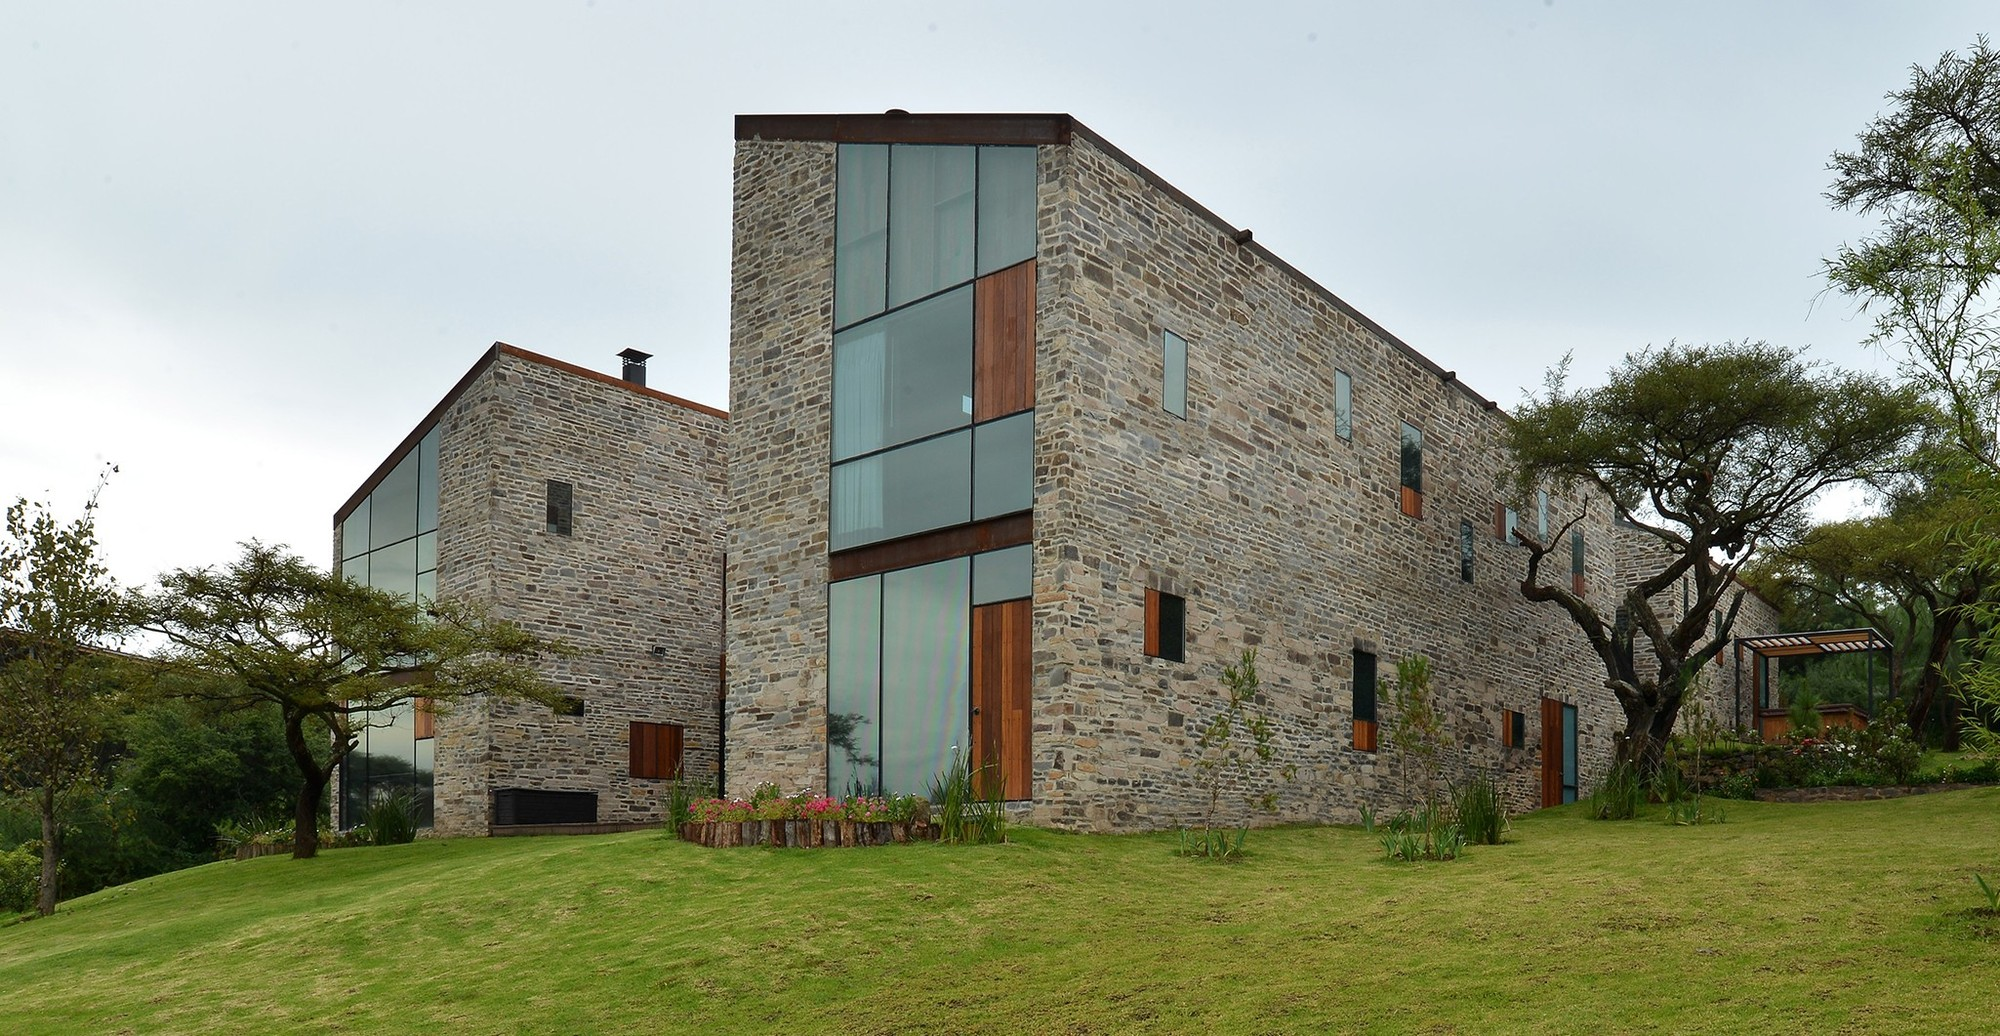 Casa em Atemajac / Villar Watty Arquitectos, © Francisco Gutiérrez